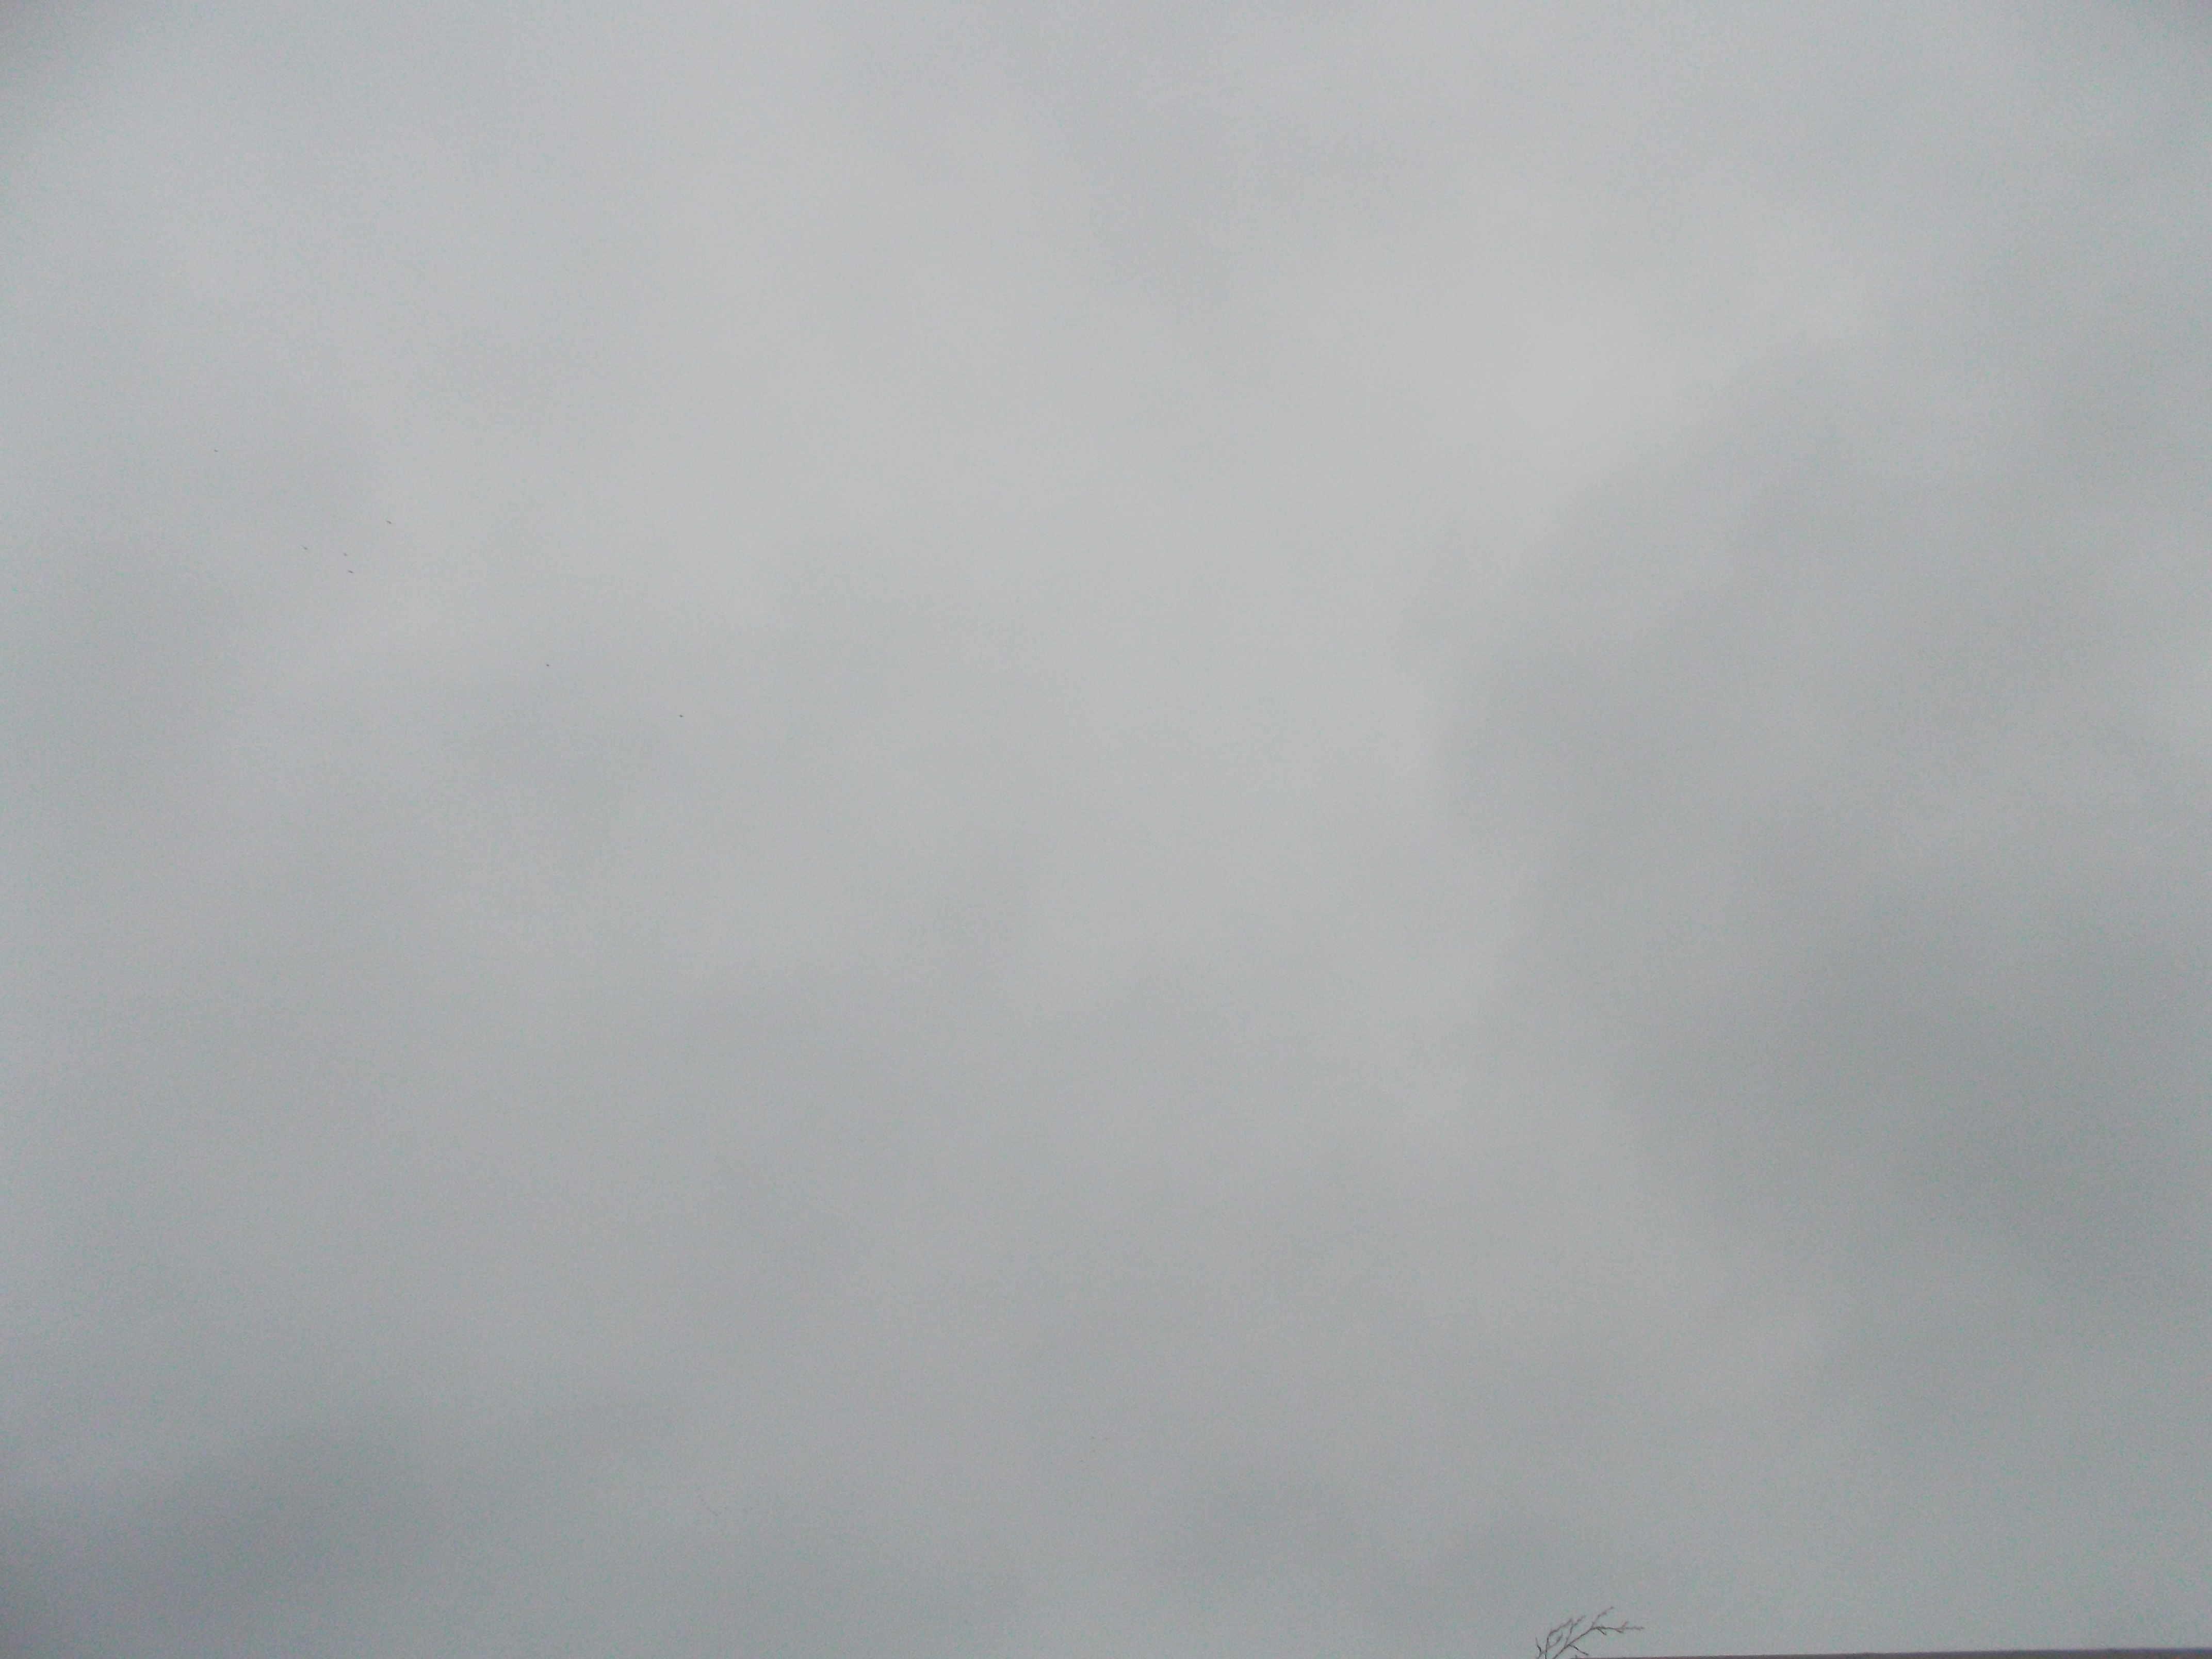 2013-03-11 Longitude -0.360578 Latitude 49.168919 Altitude 29 Heure 13h43